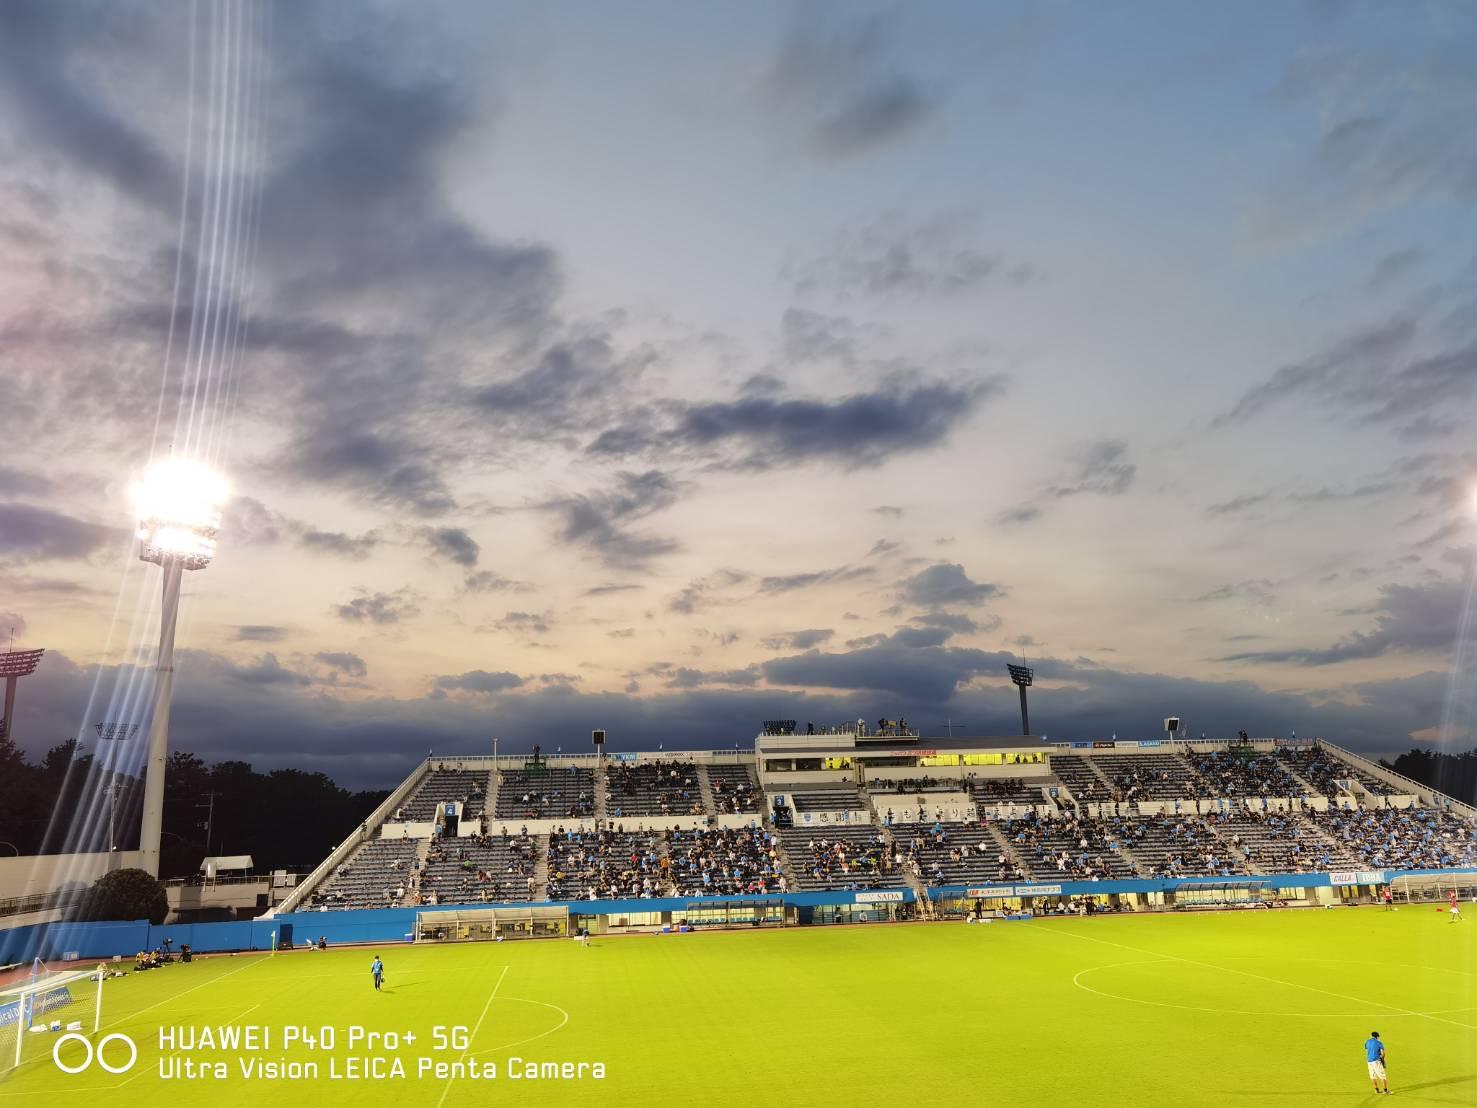 Jリーグ観戦記@2020〜横浜FCvsサンフレッチェ広島〜